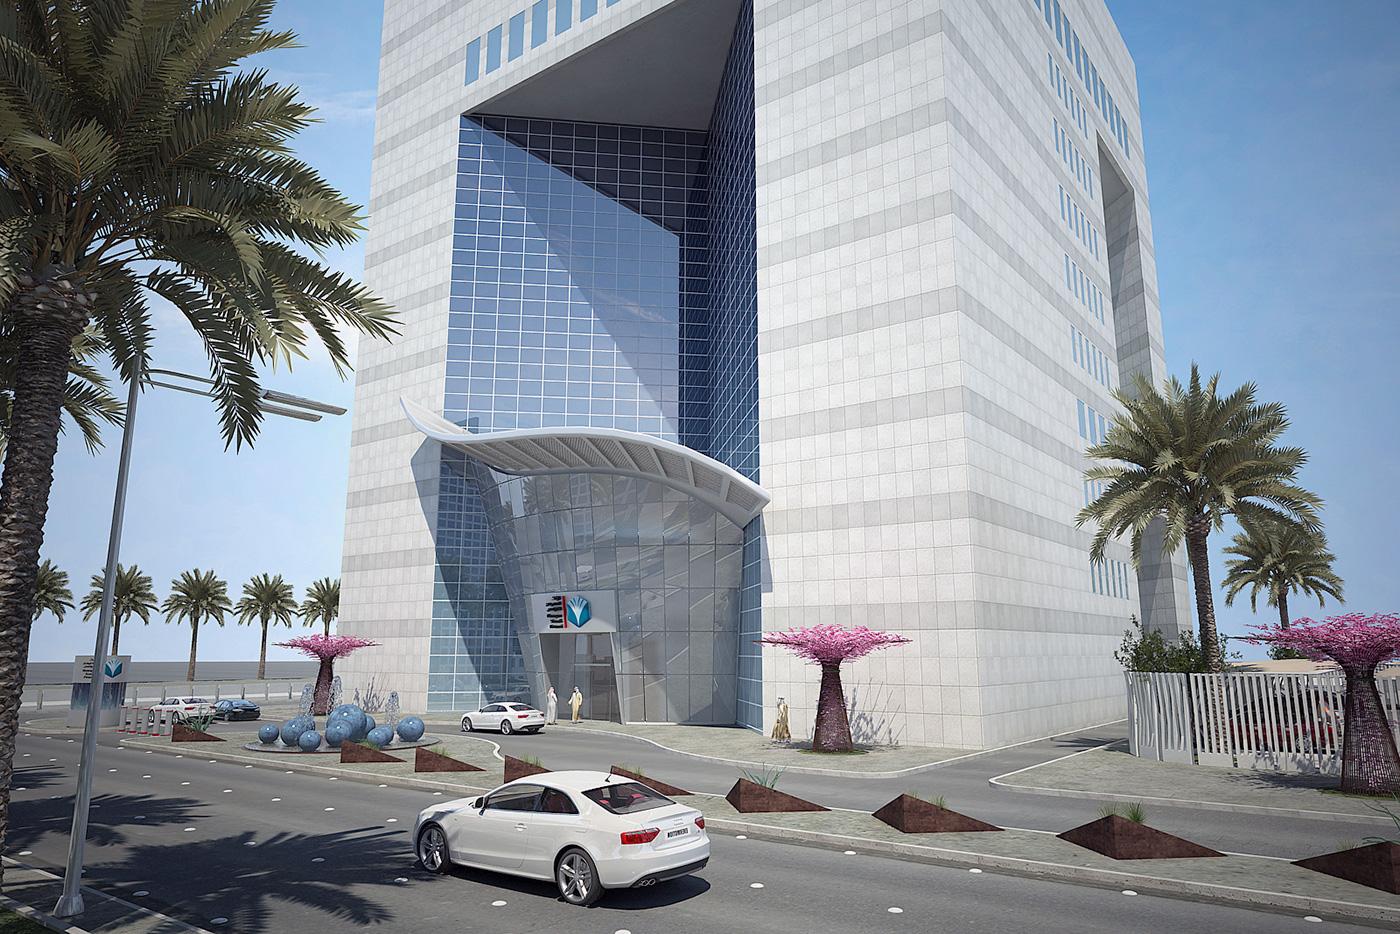 Banque Saudi Fransi Headquarters